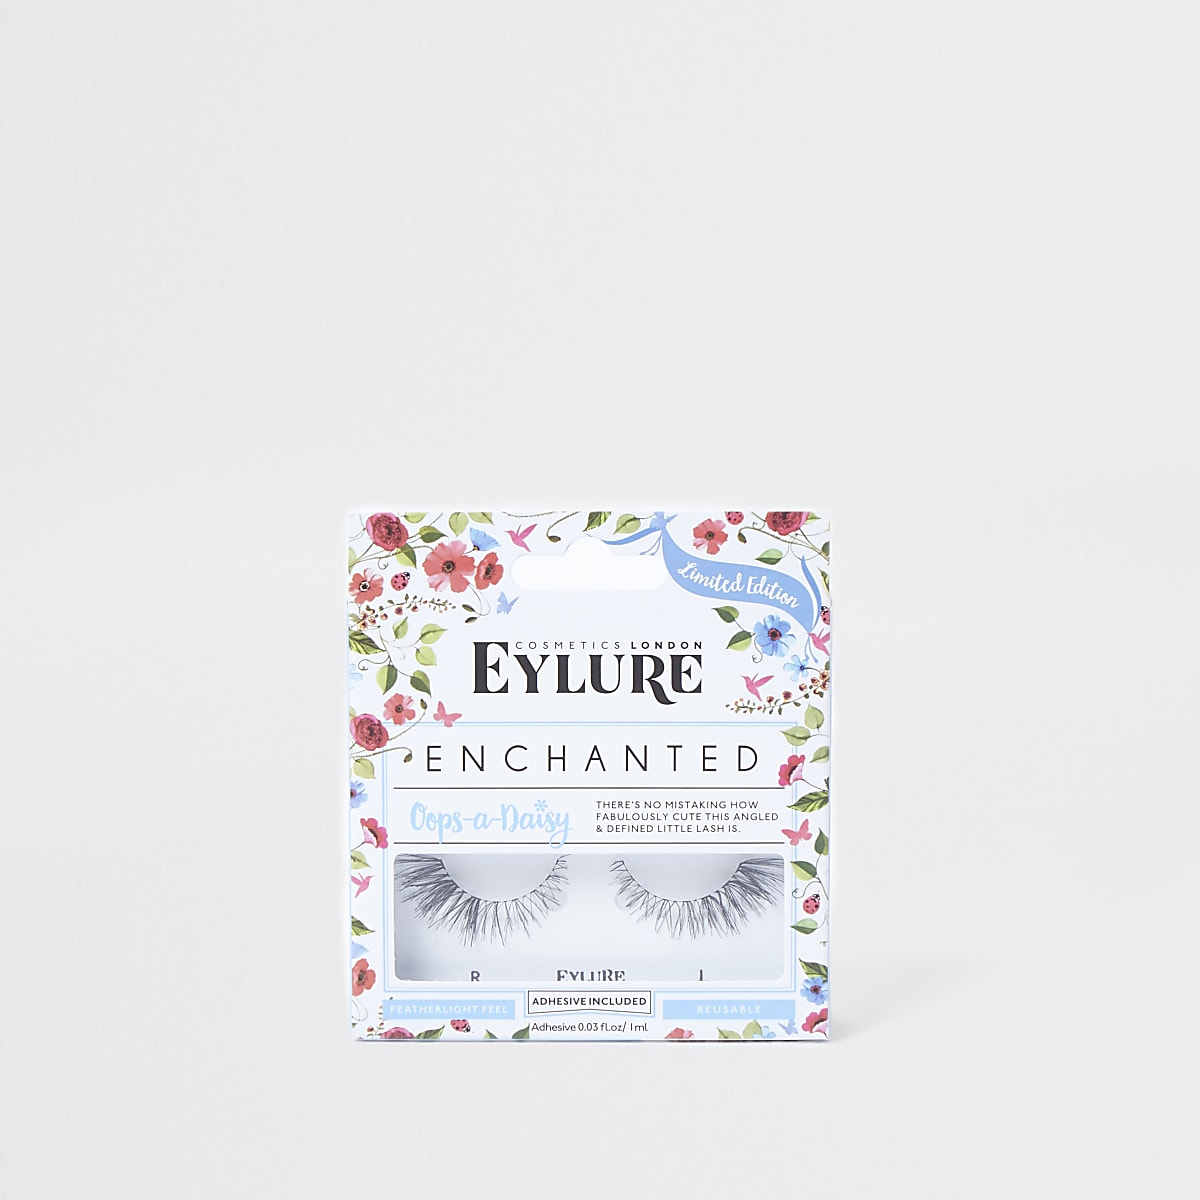 Eylure Oops-a-daisy eyelashes